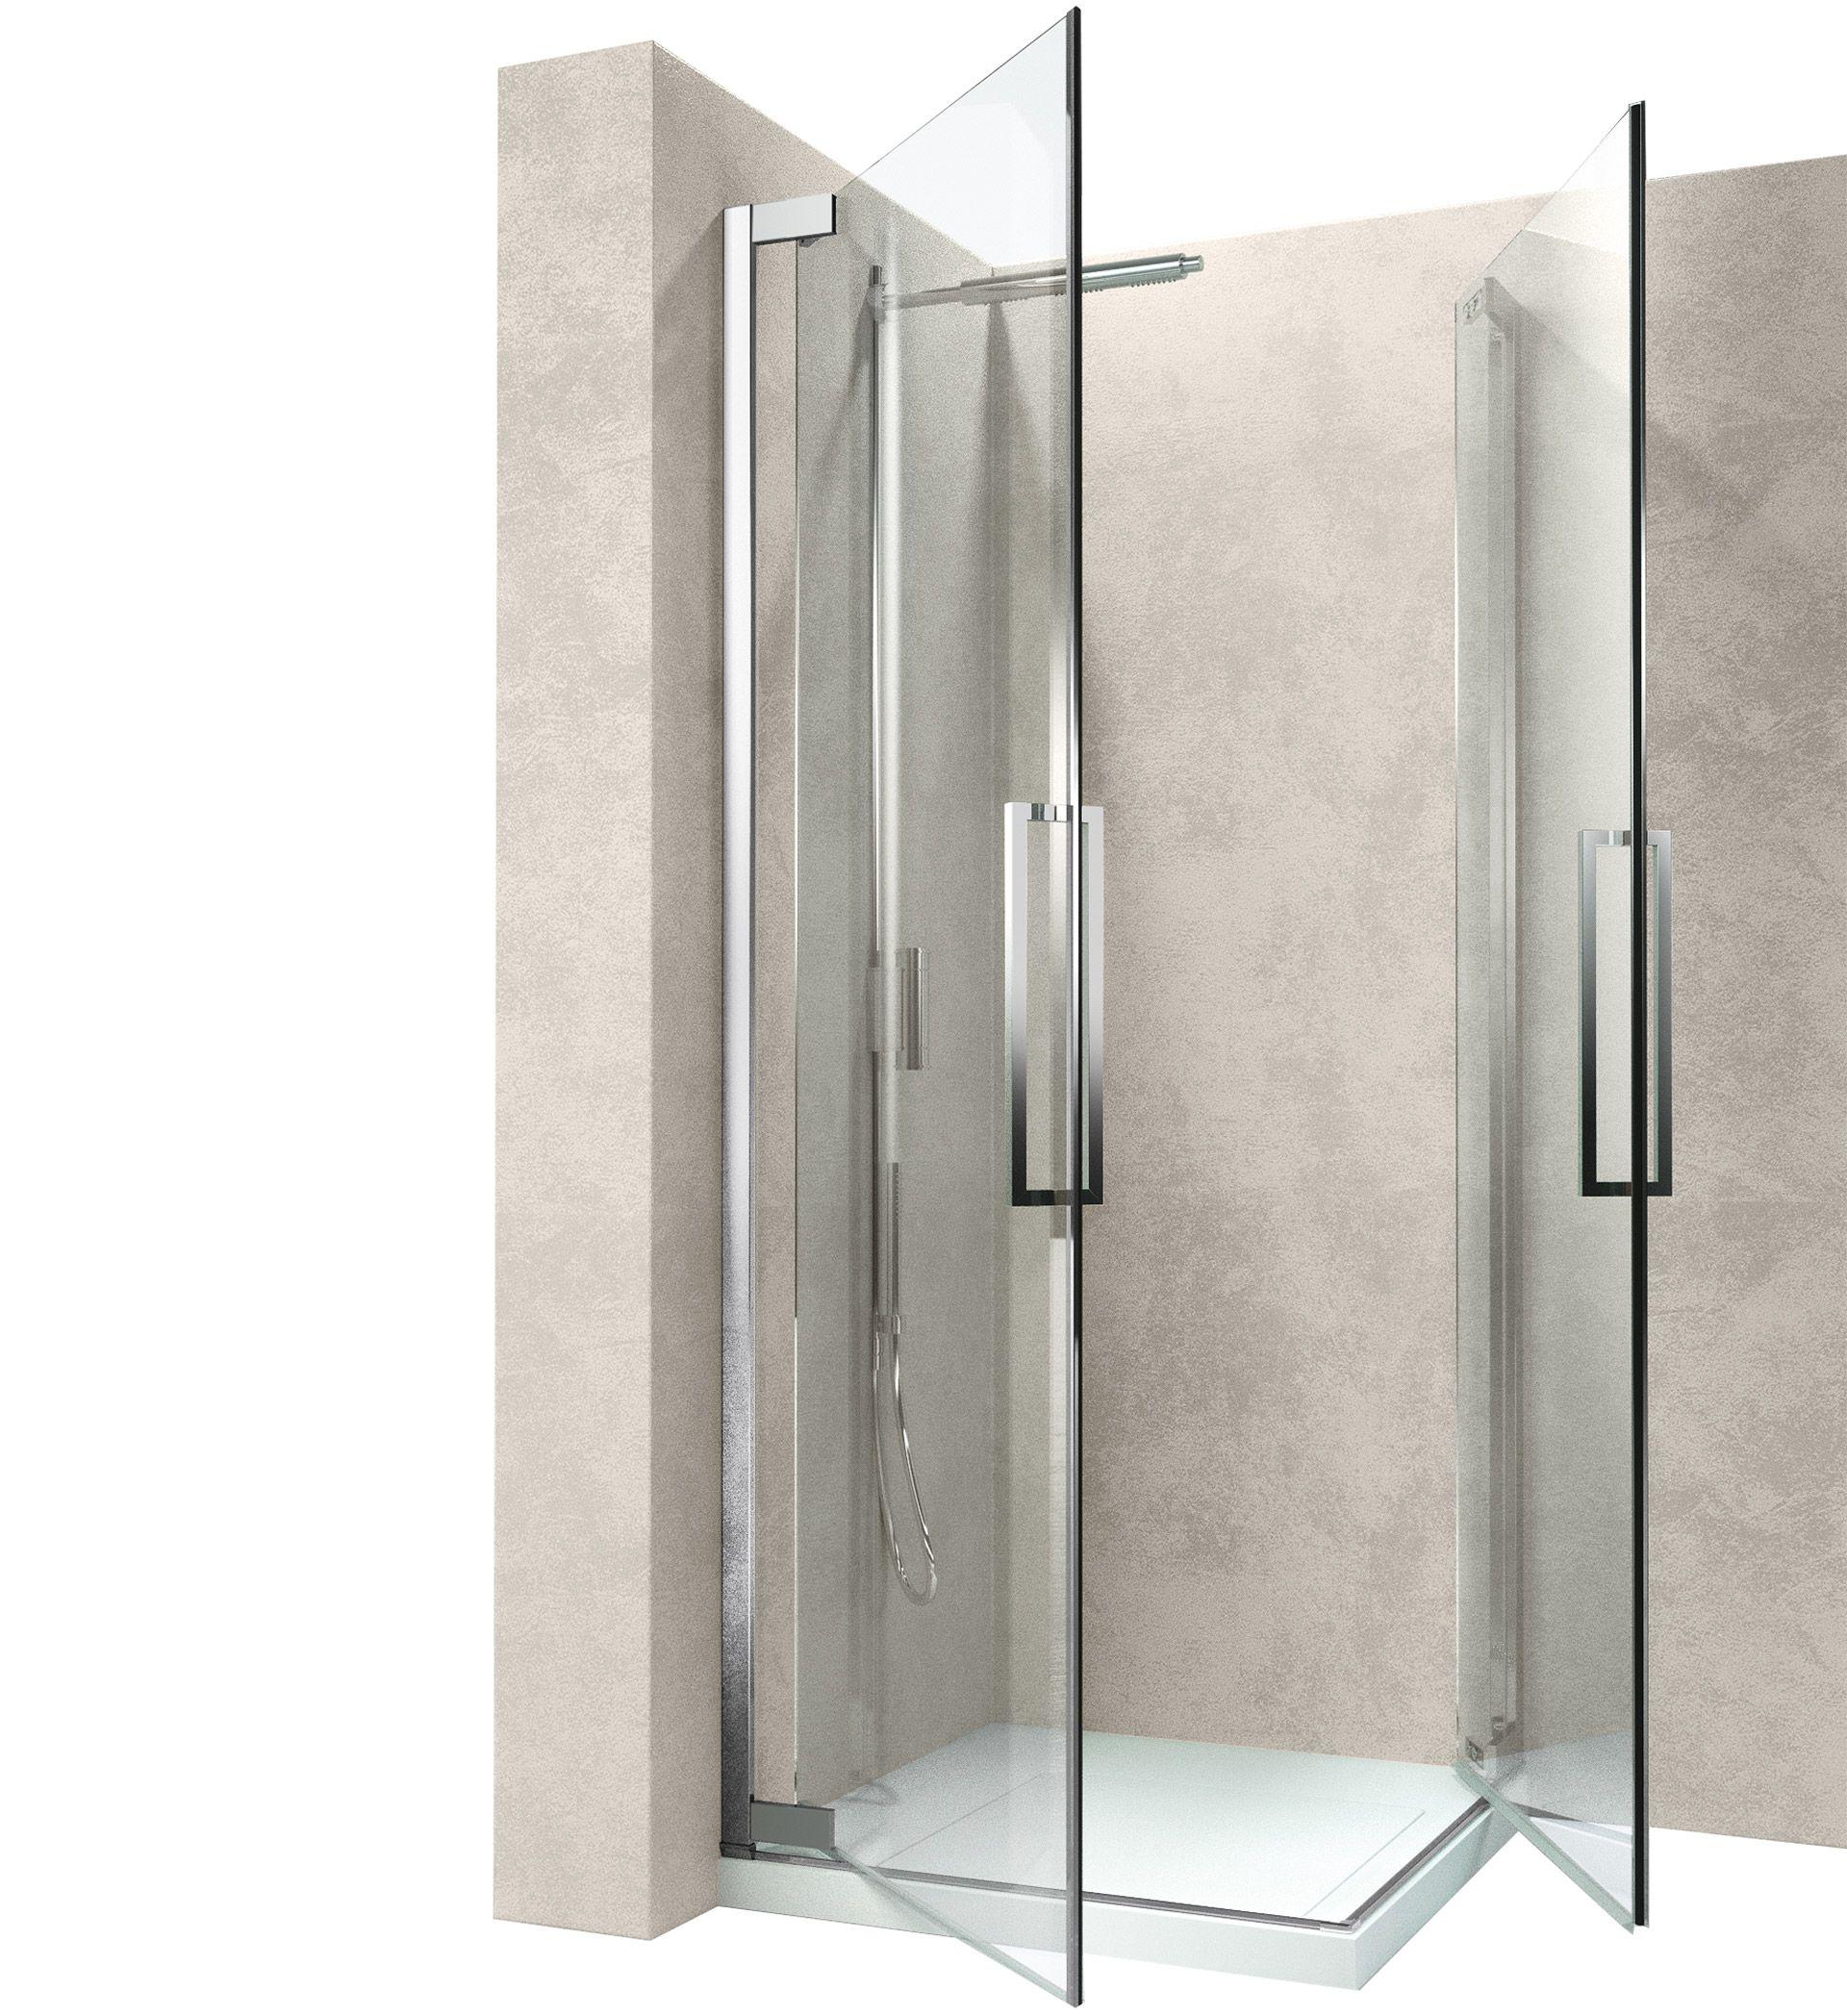 Flare The Pivot Door Shower Enclosure By Vismaravetro Shower Enclosure Bath Shower Enclosures Glass Shower Enclosures